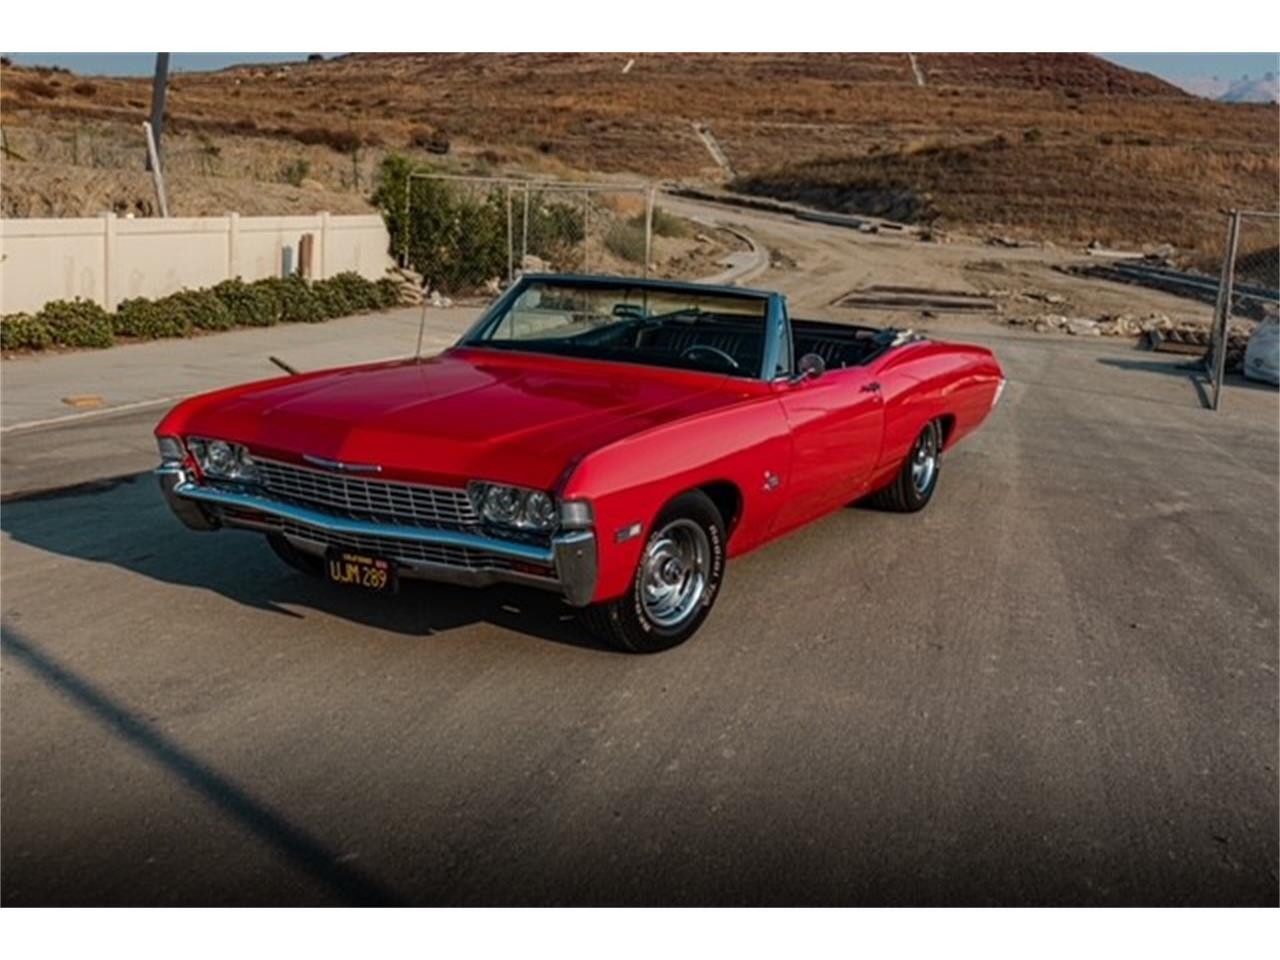 1968 Chevrolet Impala (CC-1418690) for sale in Porter Ranch, California